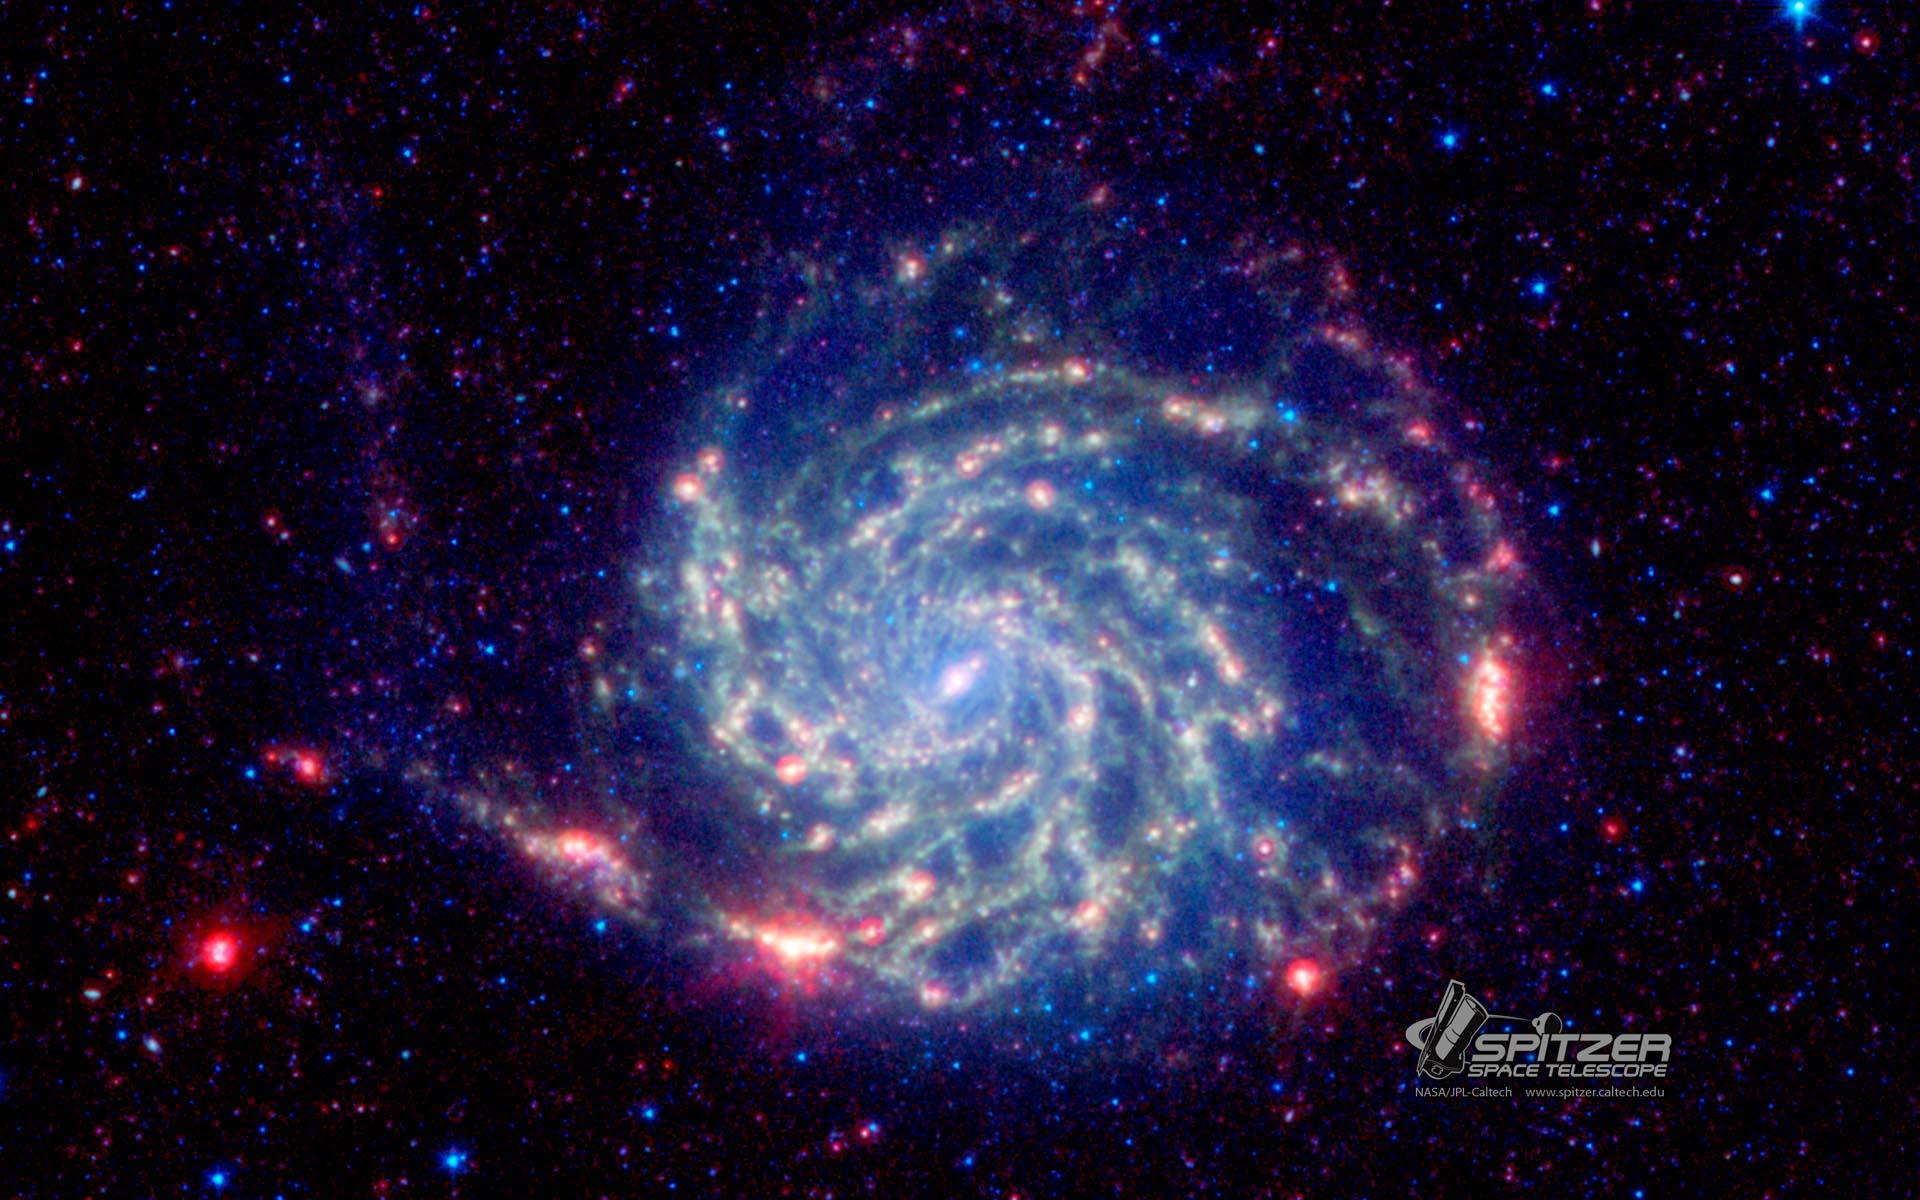 Galaxy clipart nasa Telescope Wallpapers Nasa Space Free